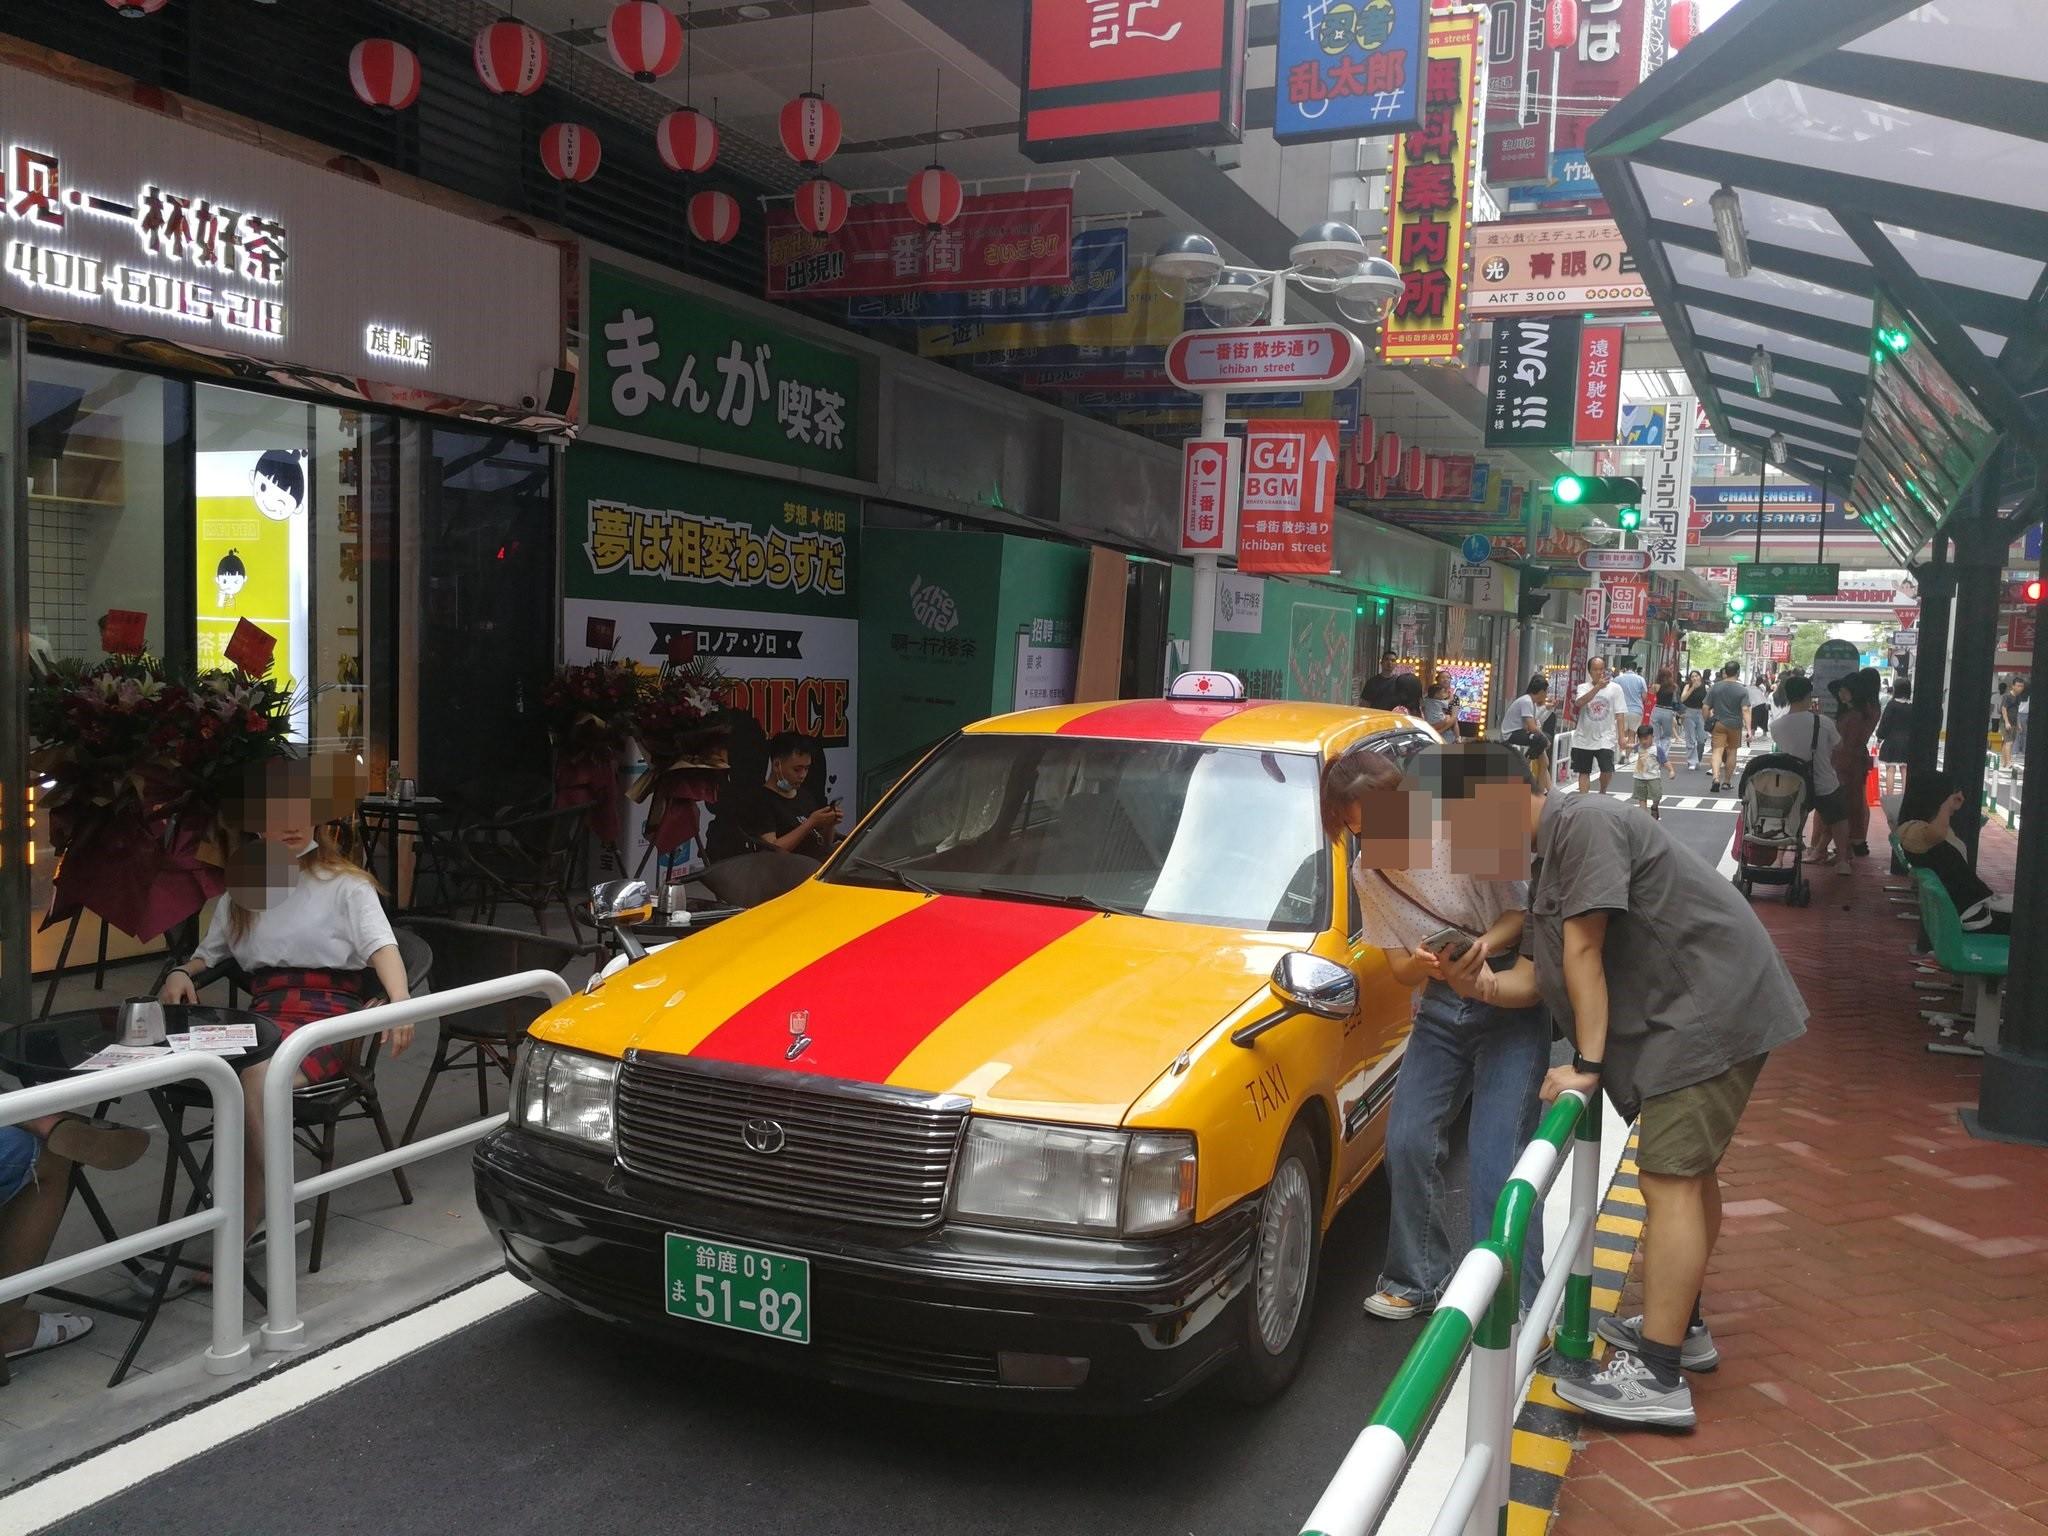 ▲▼中國山寨東京「一番街」,引起話題。(圖/翻攝自Twitter/@dancingriver)